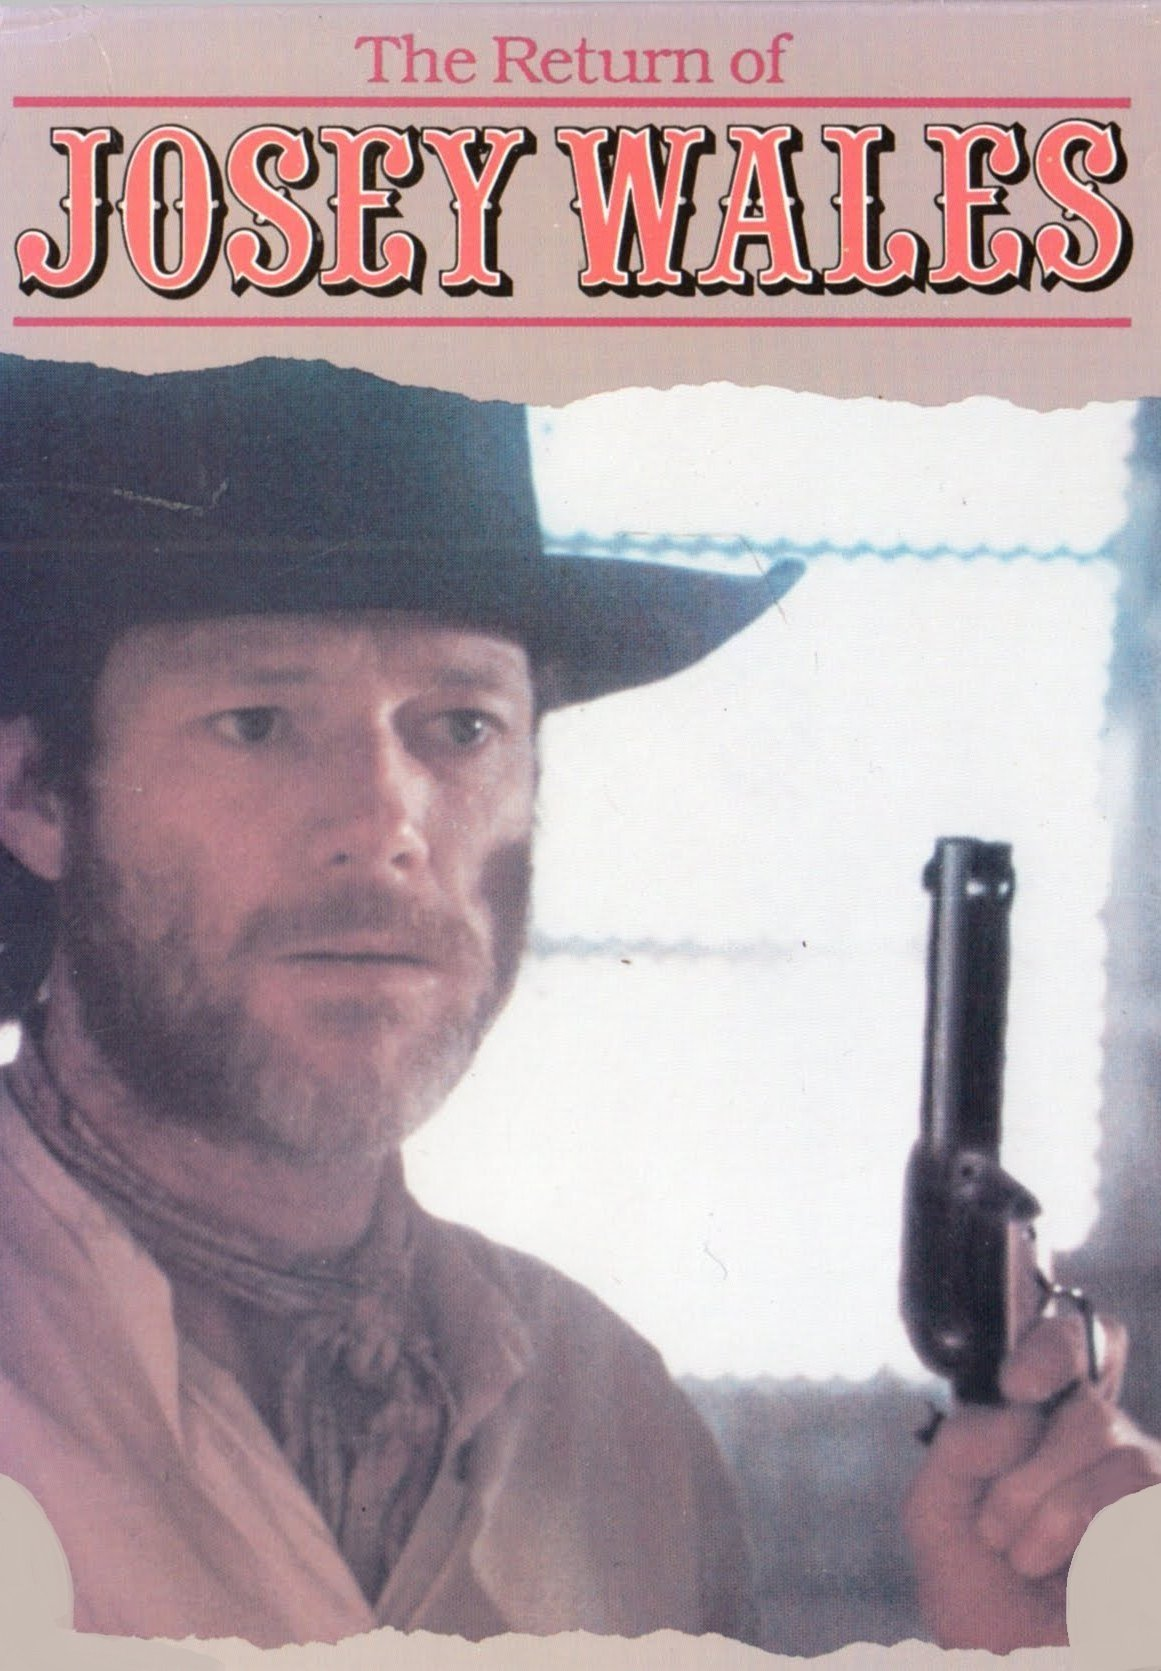 The Return of Josey Wales (1980) - IMDb